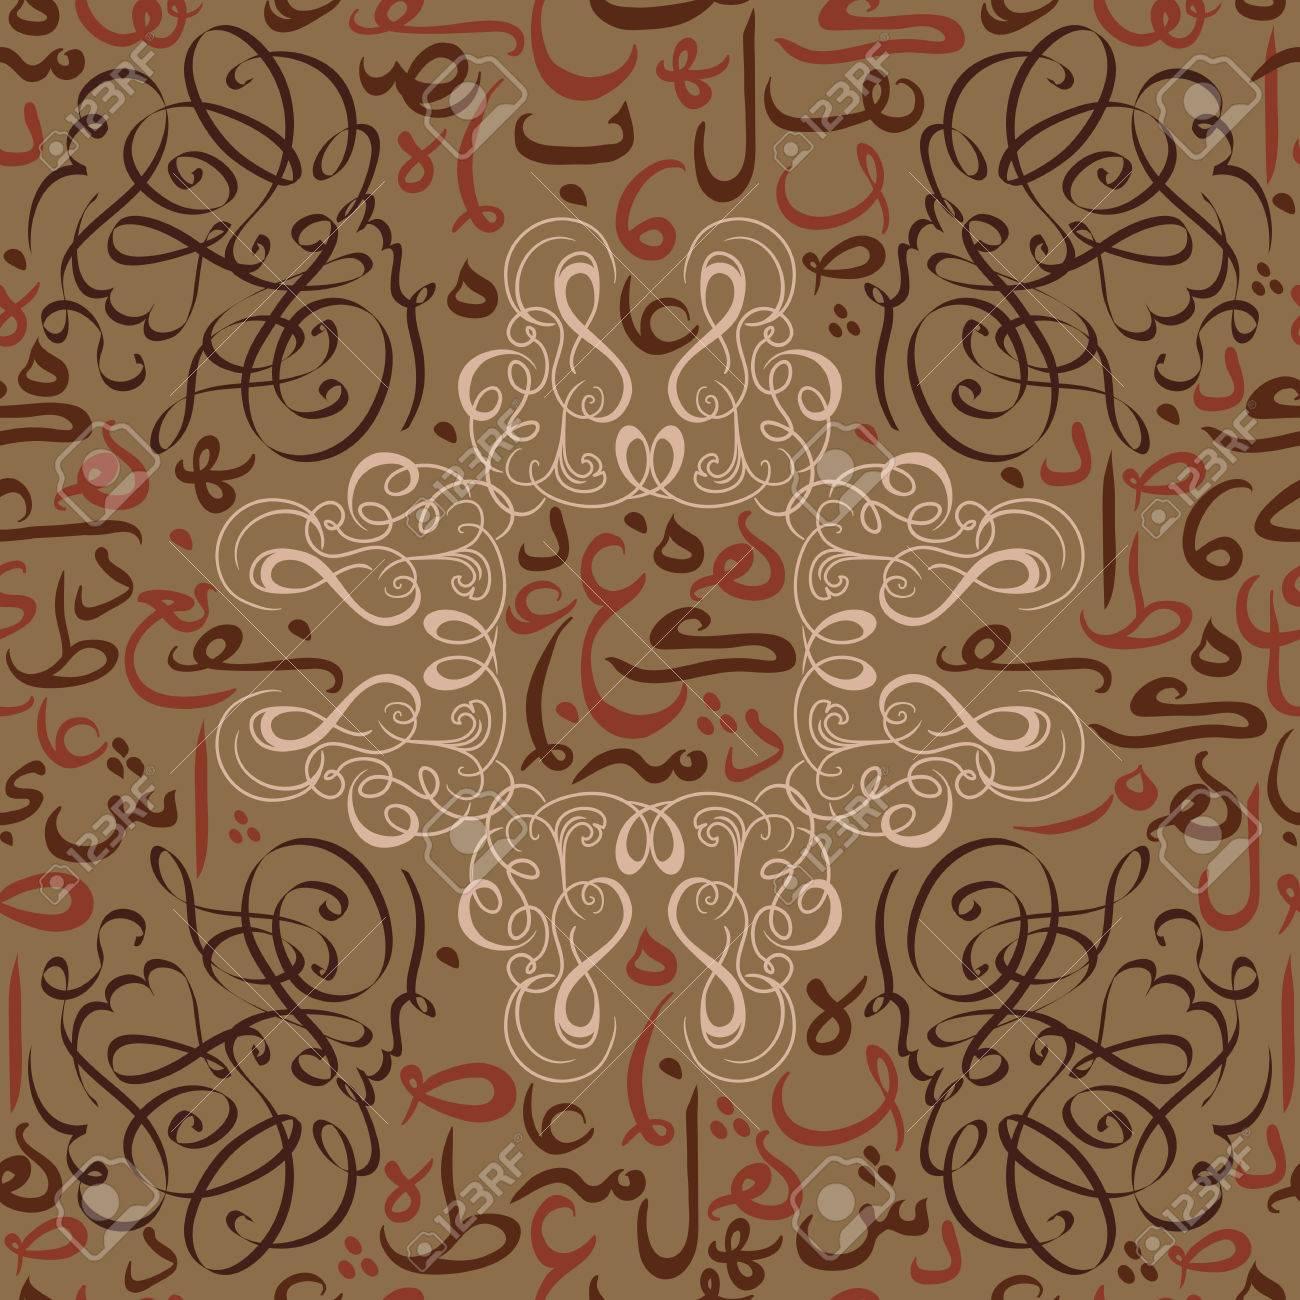 seamless pattern ornament Arabic calligraphy of text Eid Mubarak concept for muslim community festival Eid Al Fitr Eid Mubarak - 43853061